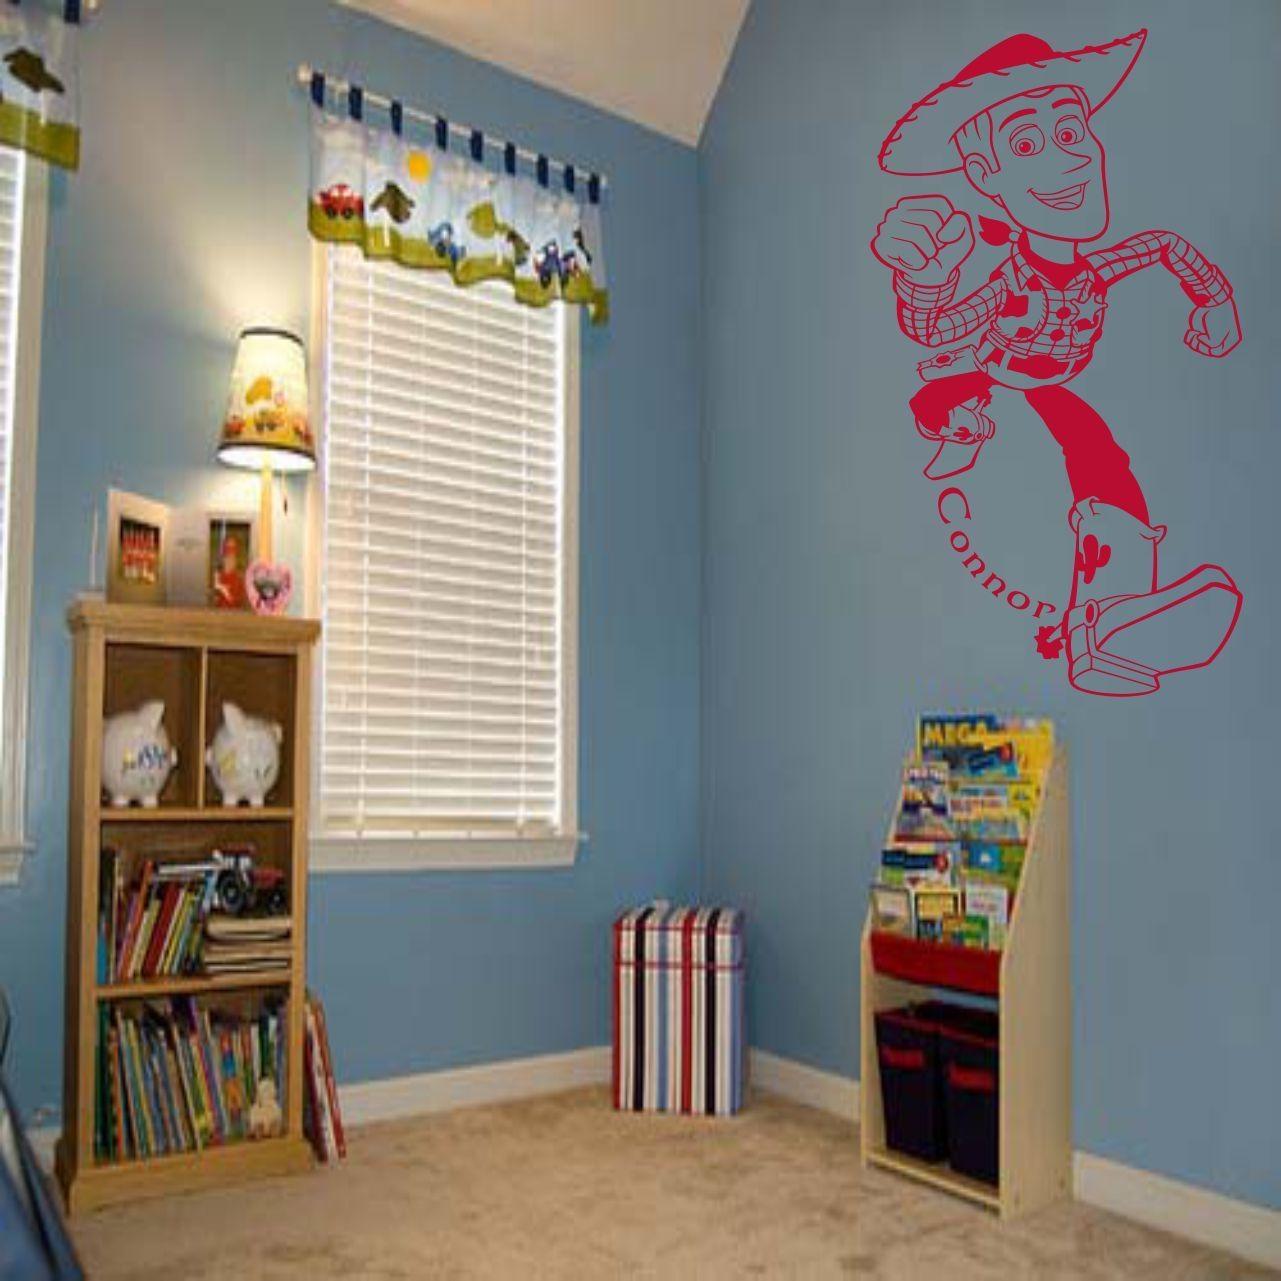 Fantastic Toy Story Woody Wall Art Decal Vinyl Sticker Wall For Toy Story Wall Stickers (Image 9 of 20)